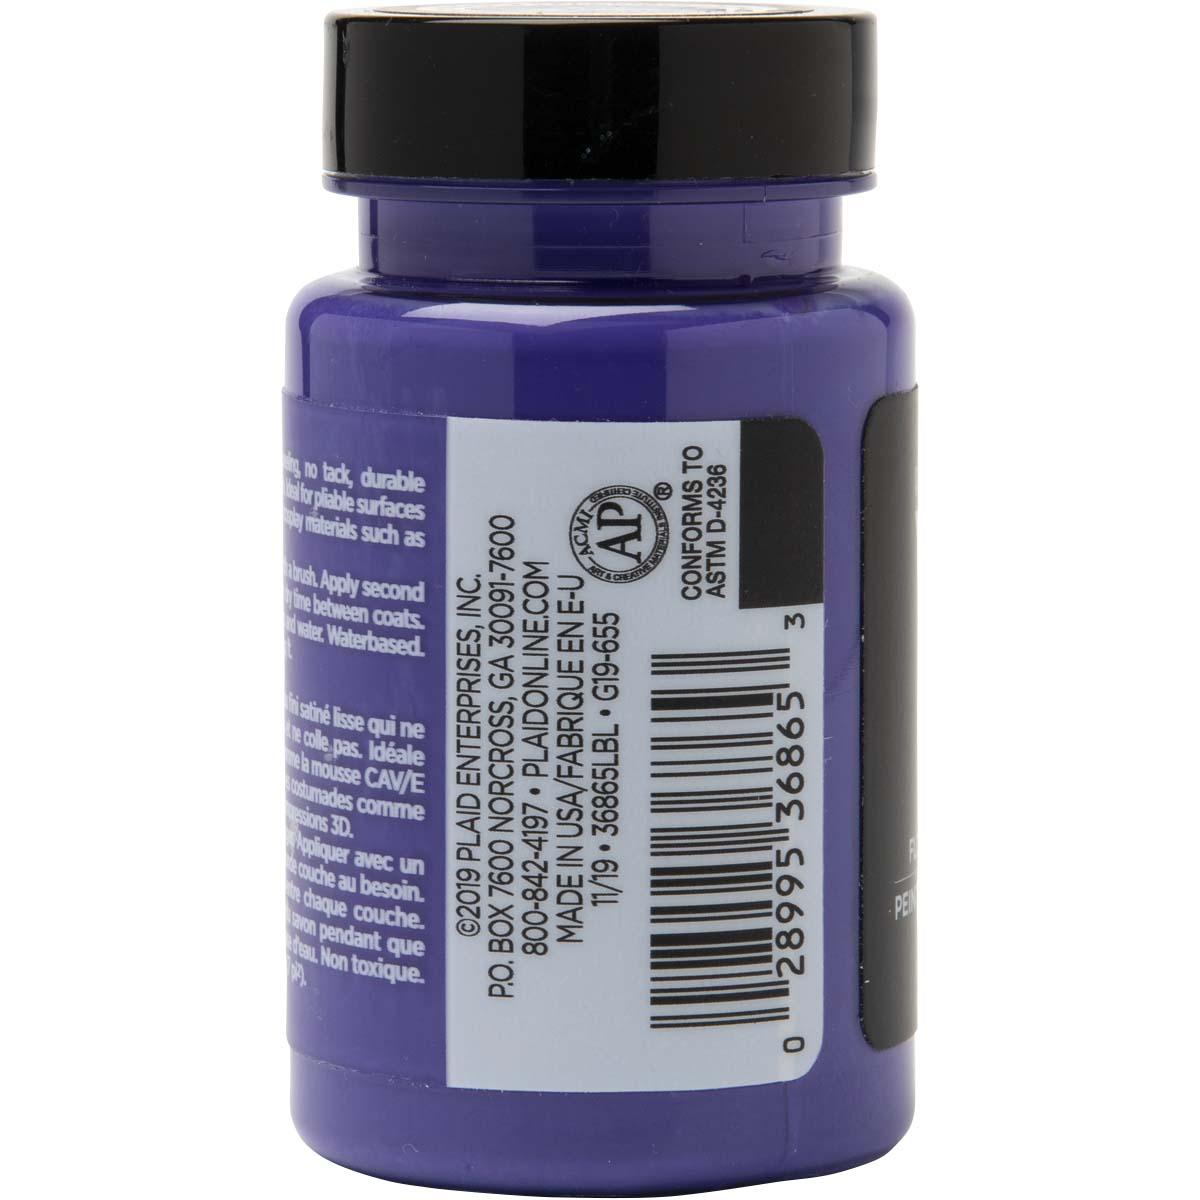 PlaidFX Smooth Satin Flexible Acrylic Paint - Voodoo Violet, 3 oz. - 36865